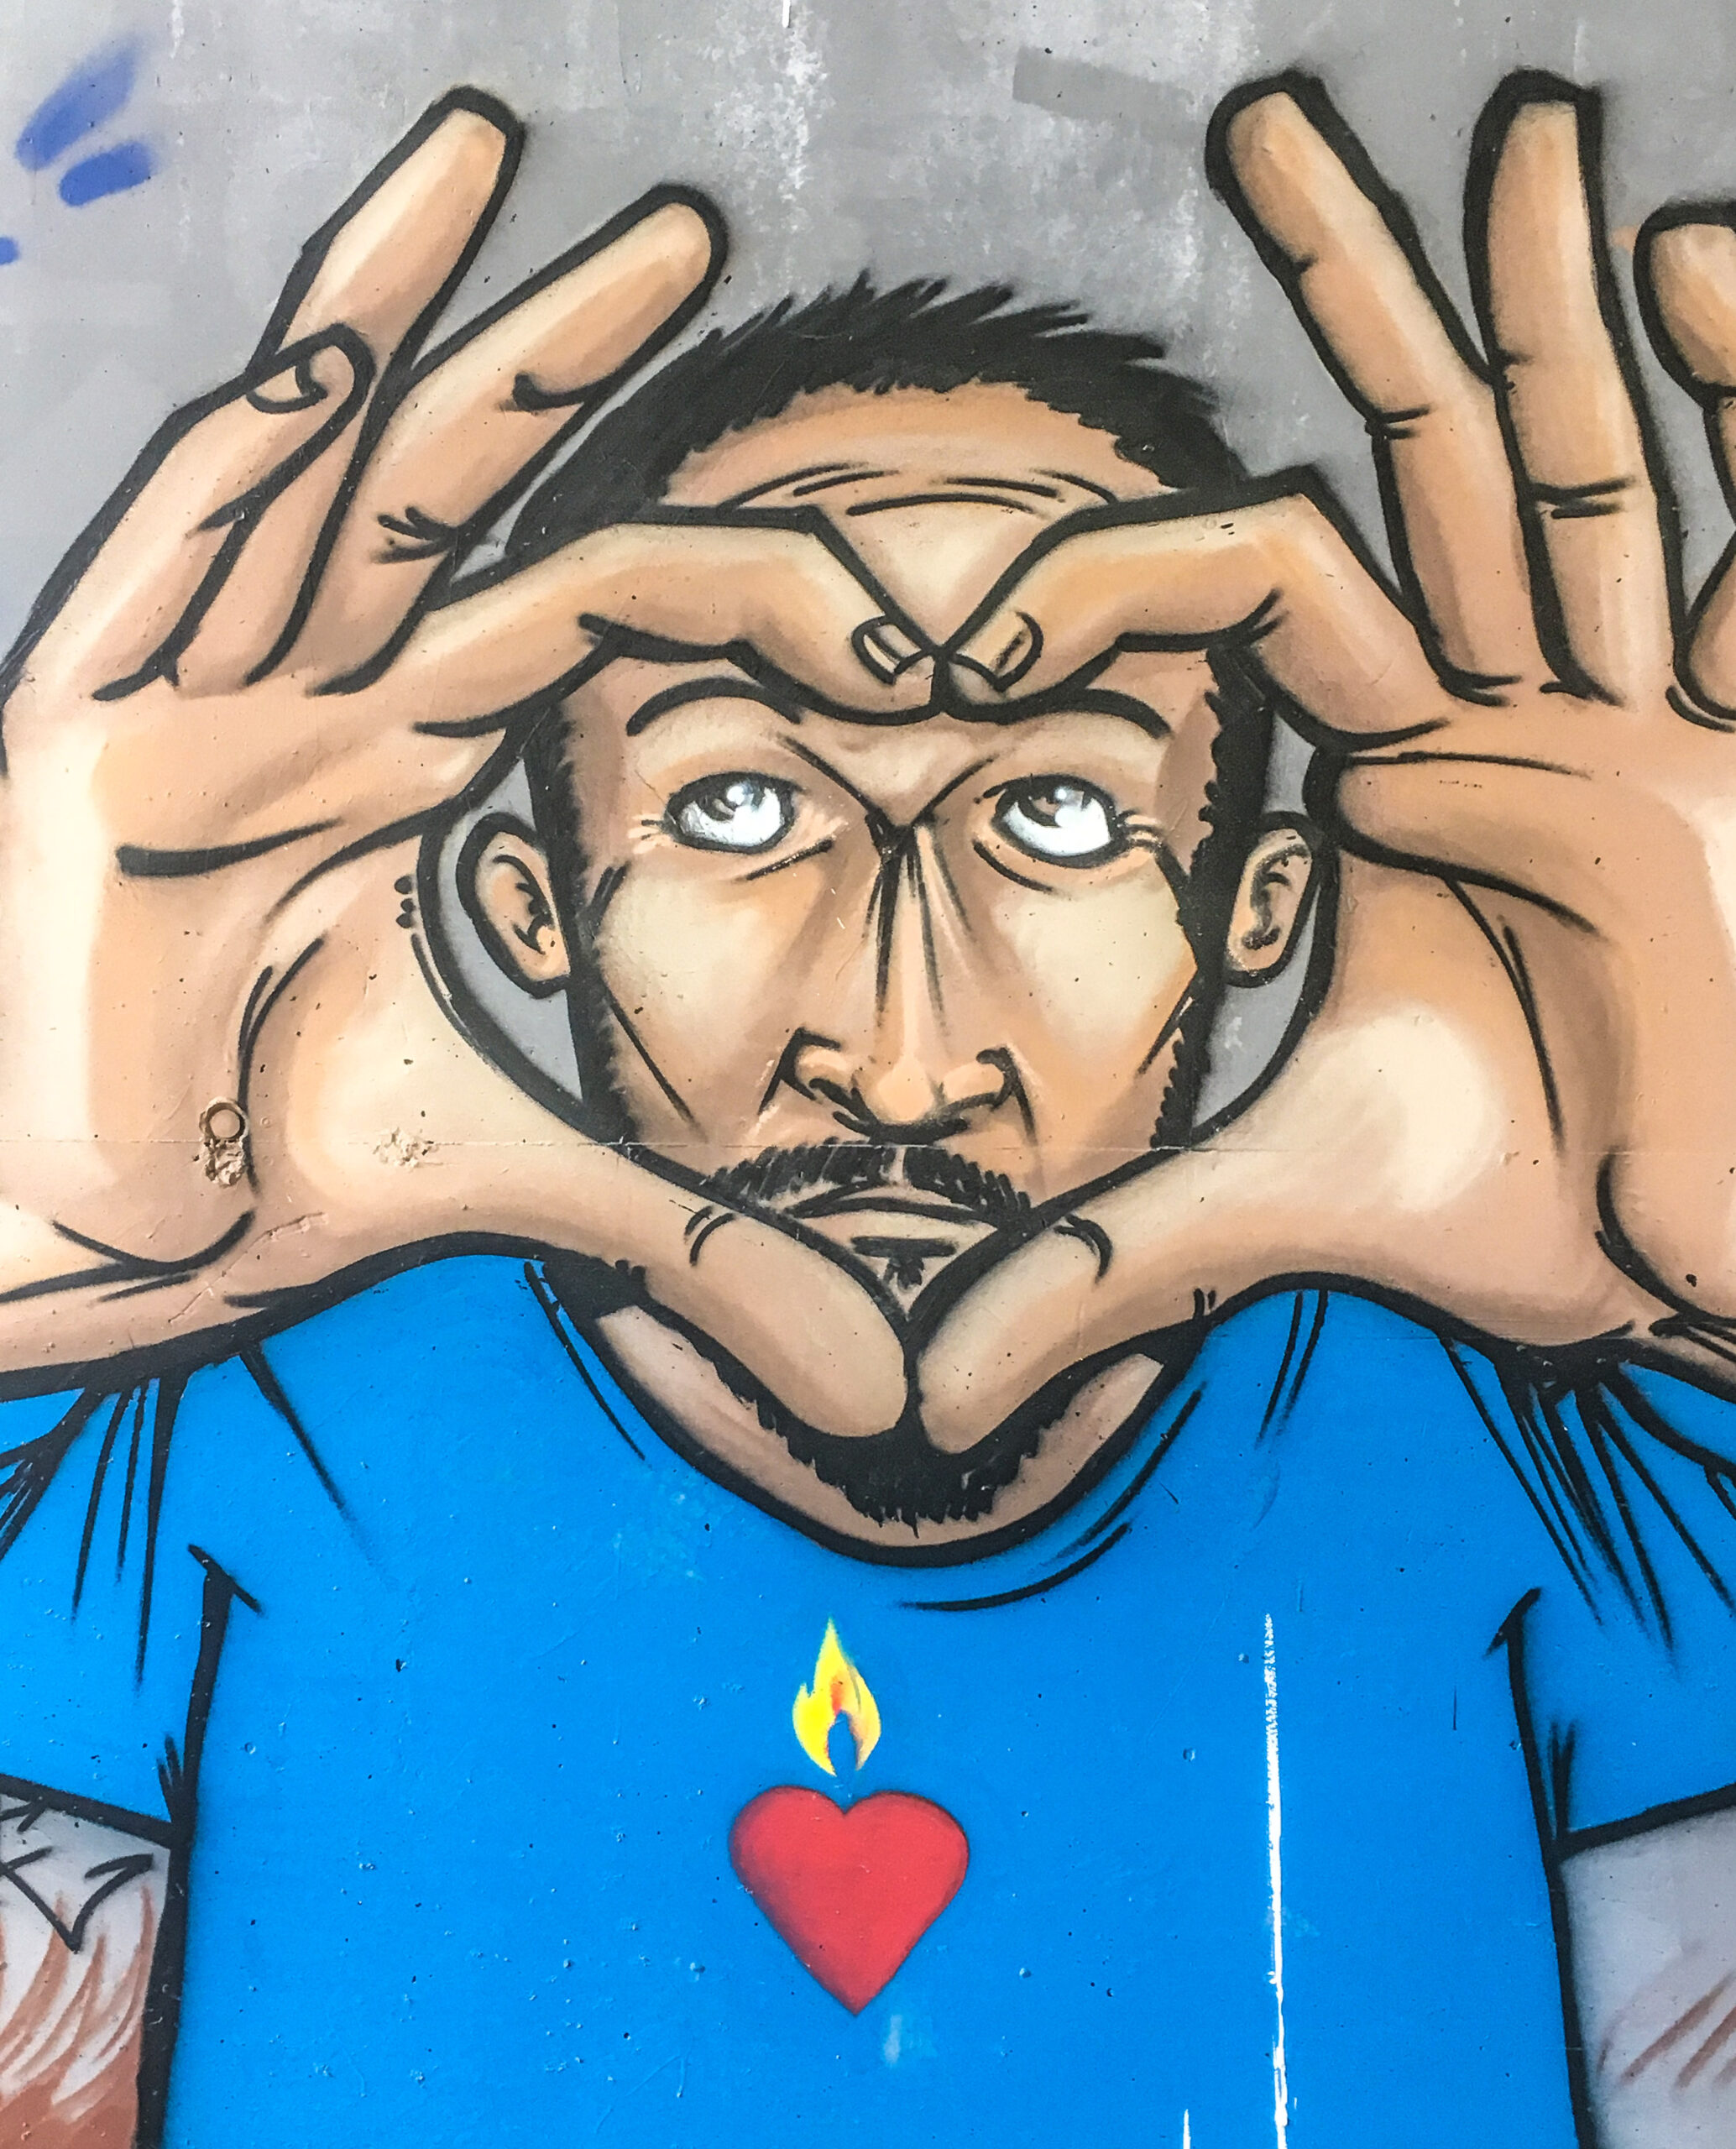 ViaRhôna, Street Art am Pont Maubeuge auf der Île Blaud. Foto: Hilke Maunder